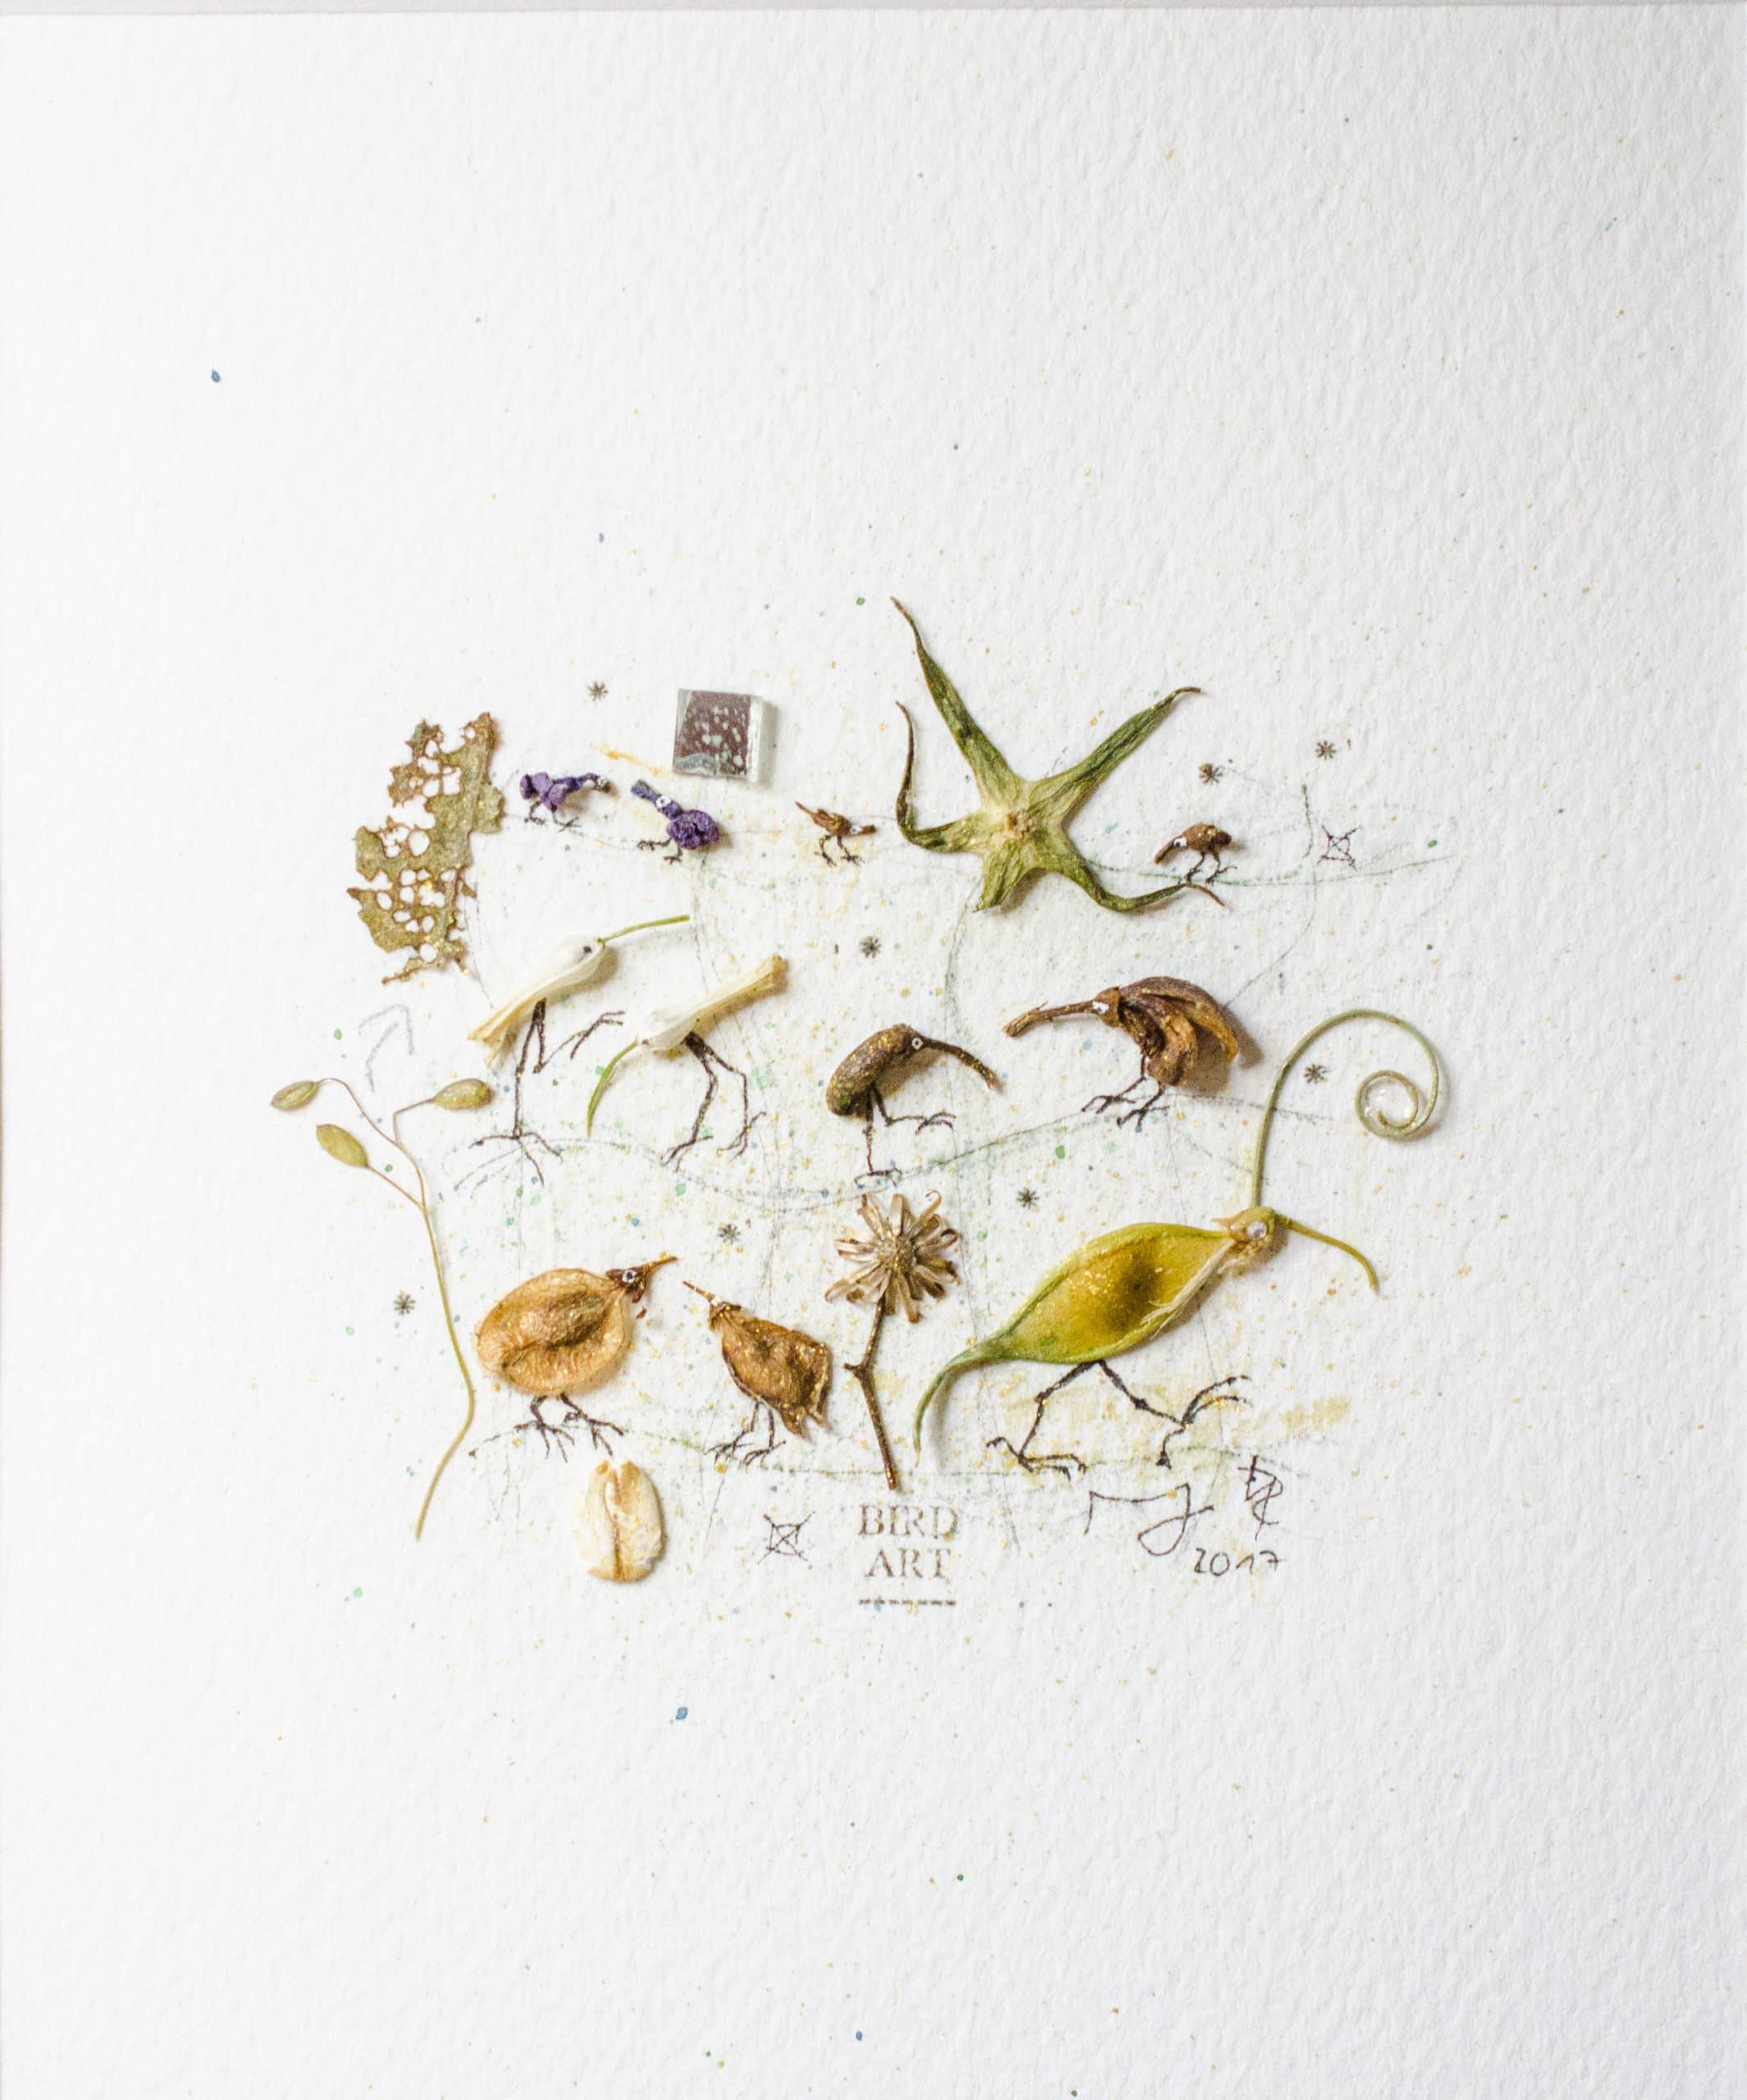 Miniature collage